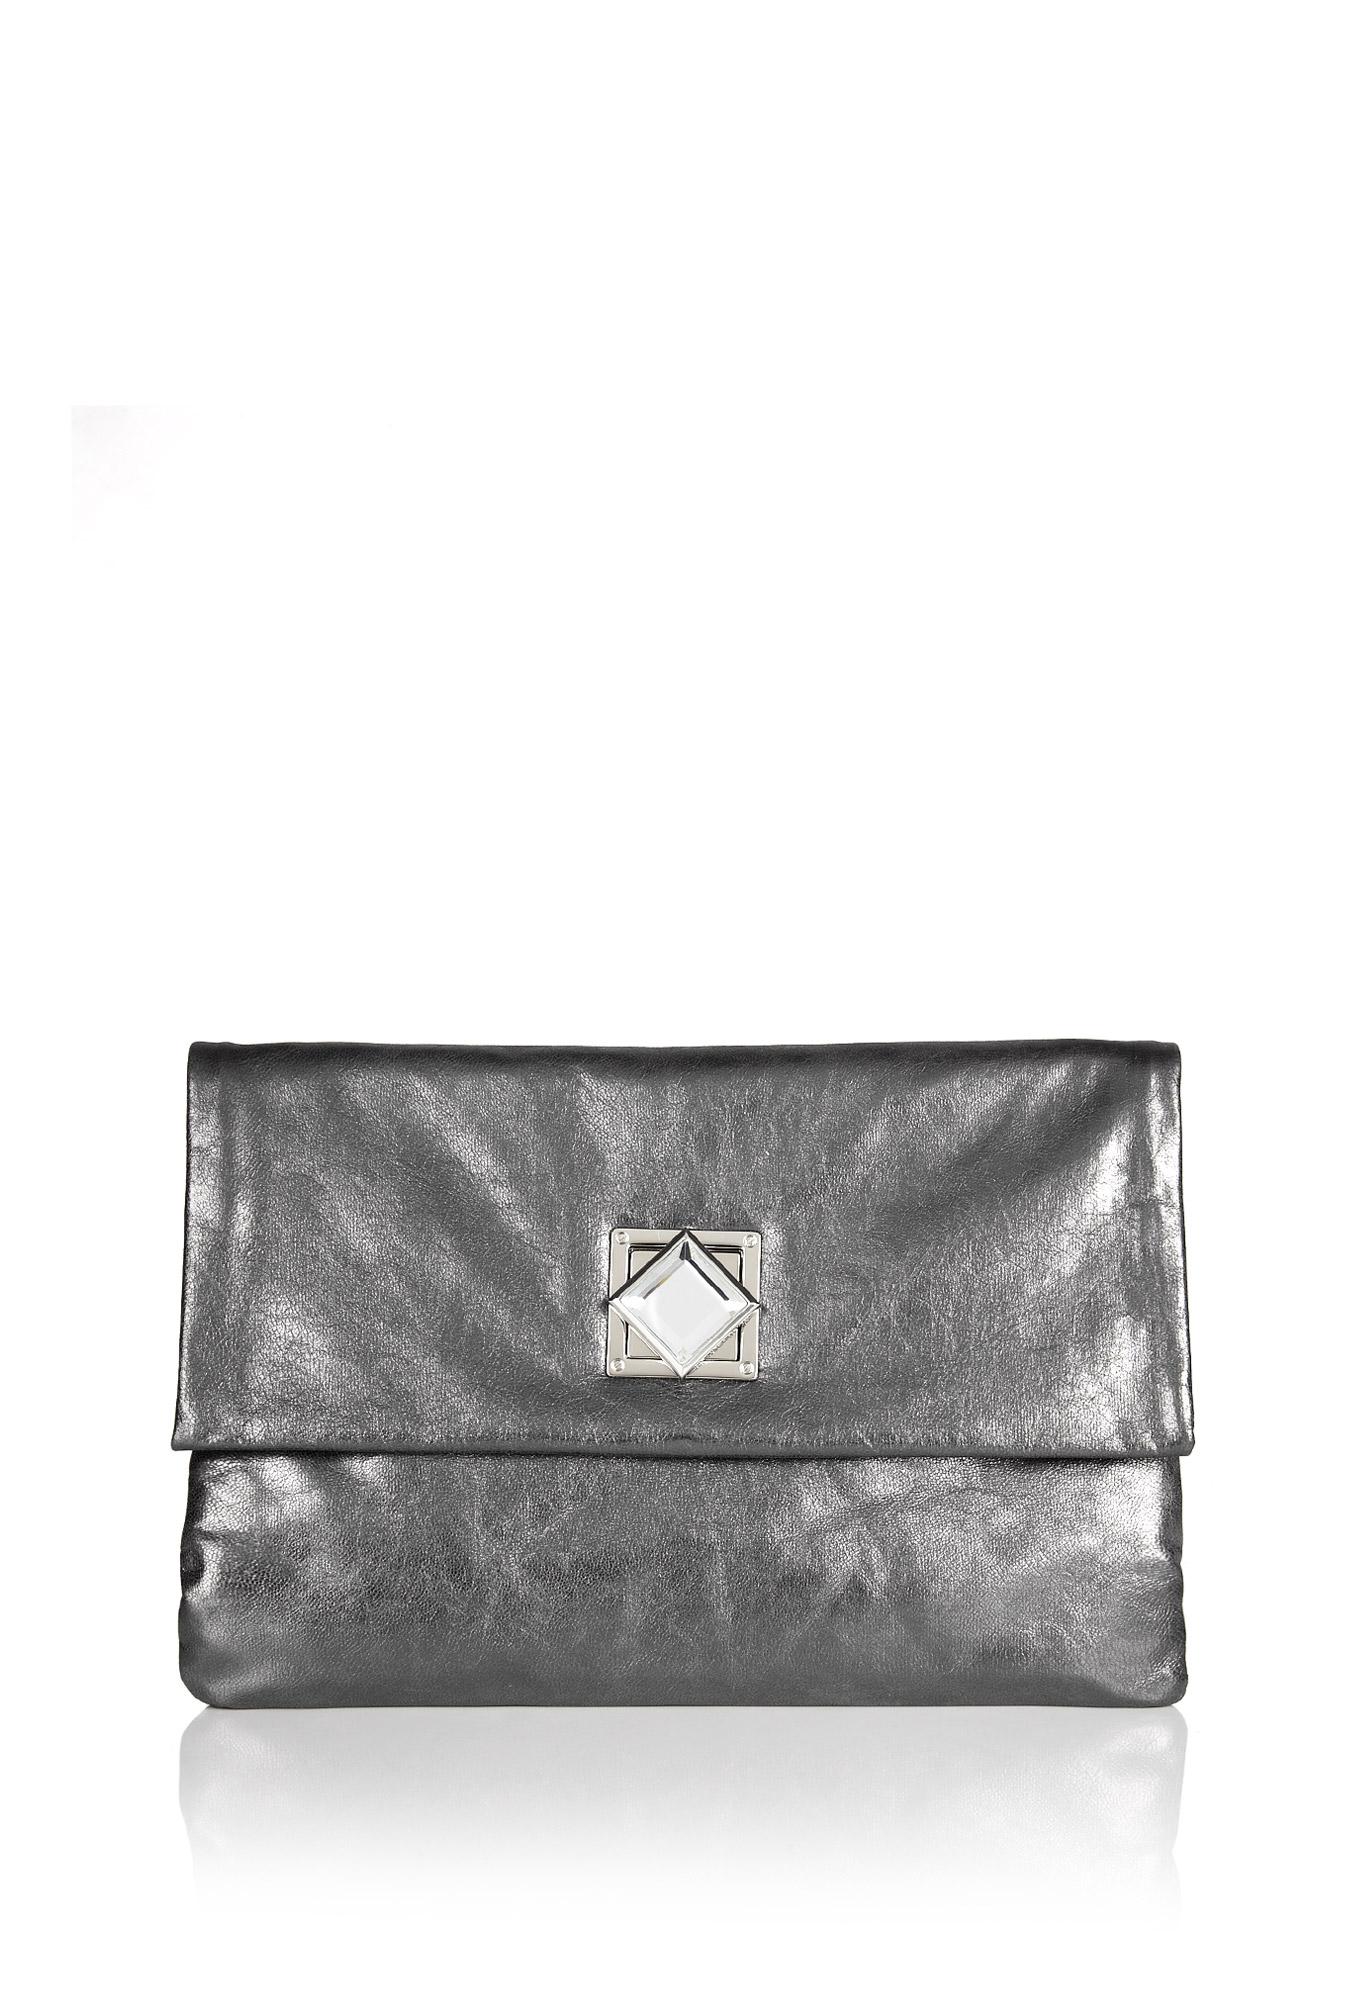 michael by michael kors gunmetal jewel clutch in silver. Black Bedroom Furniture Sets. Home Design Ideas